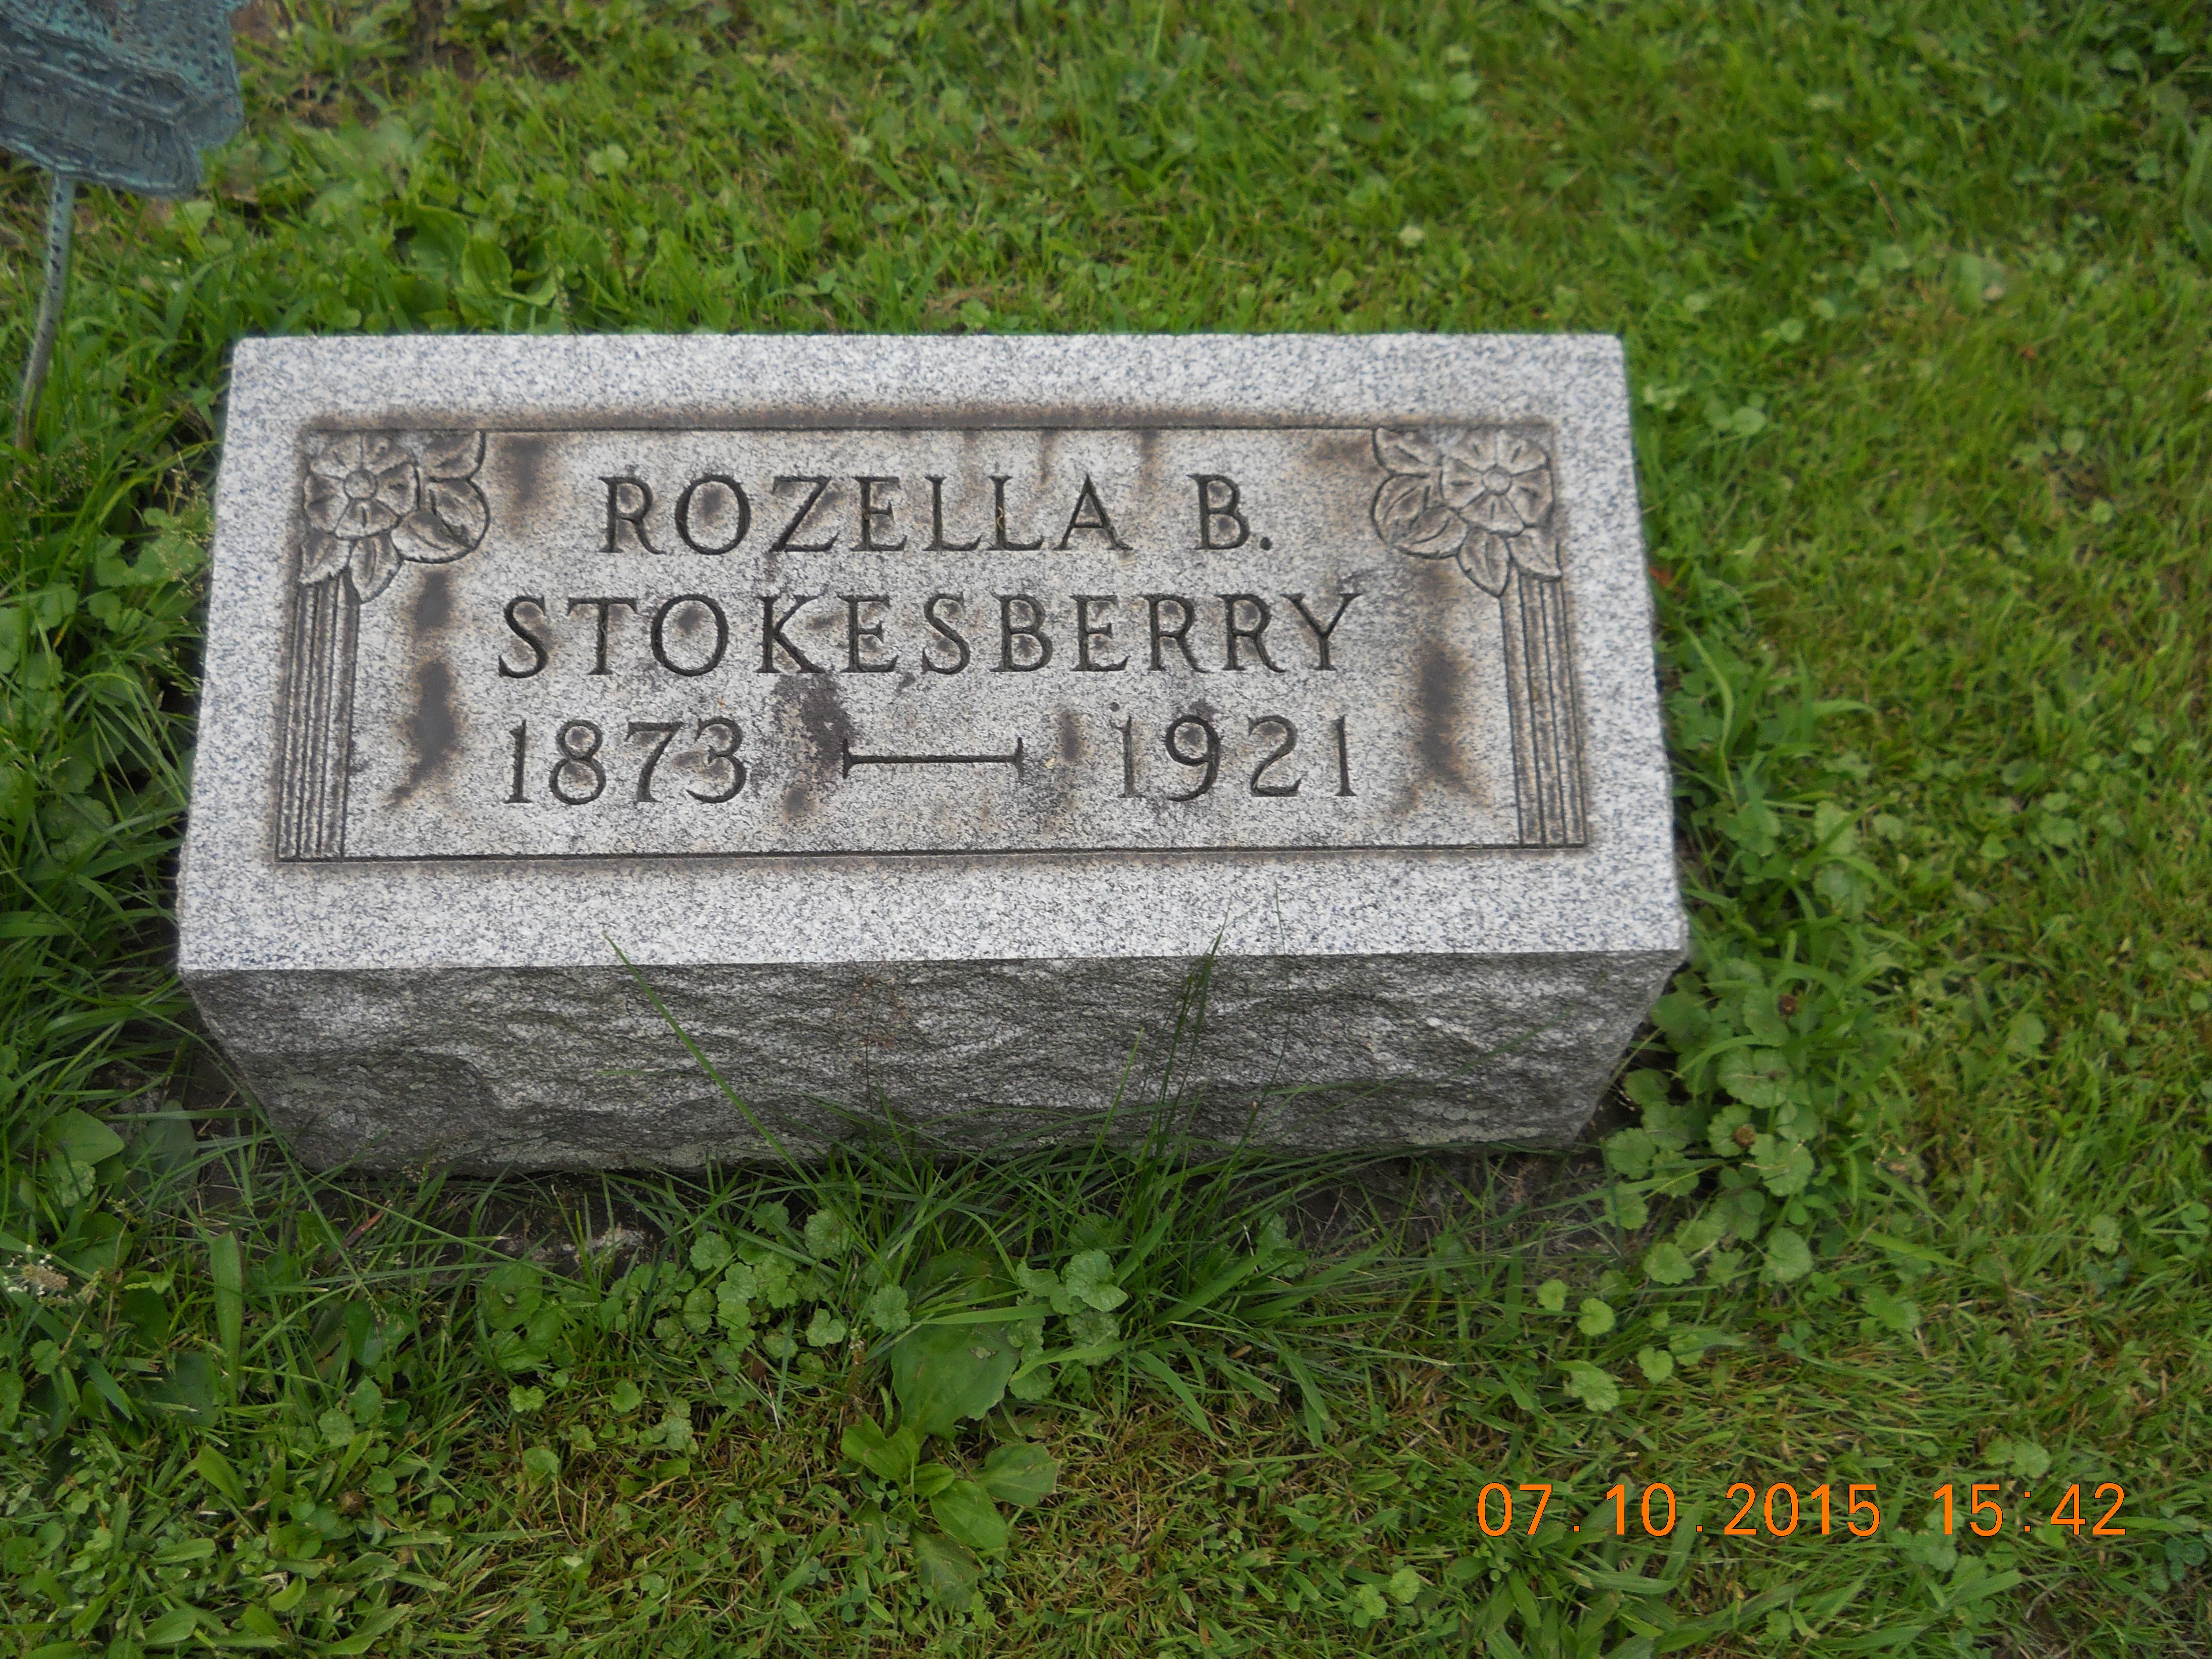 Bernard Stokesberry